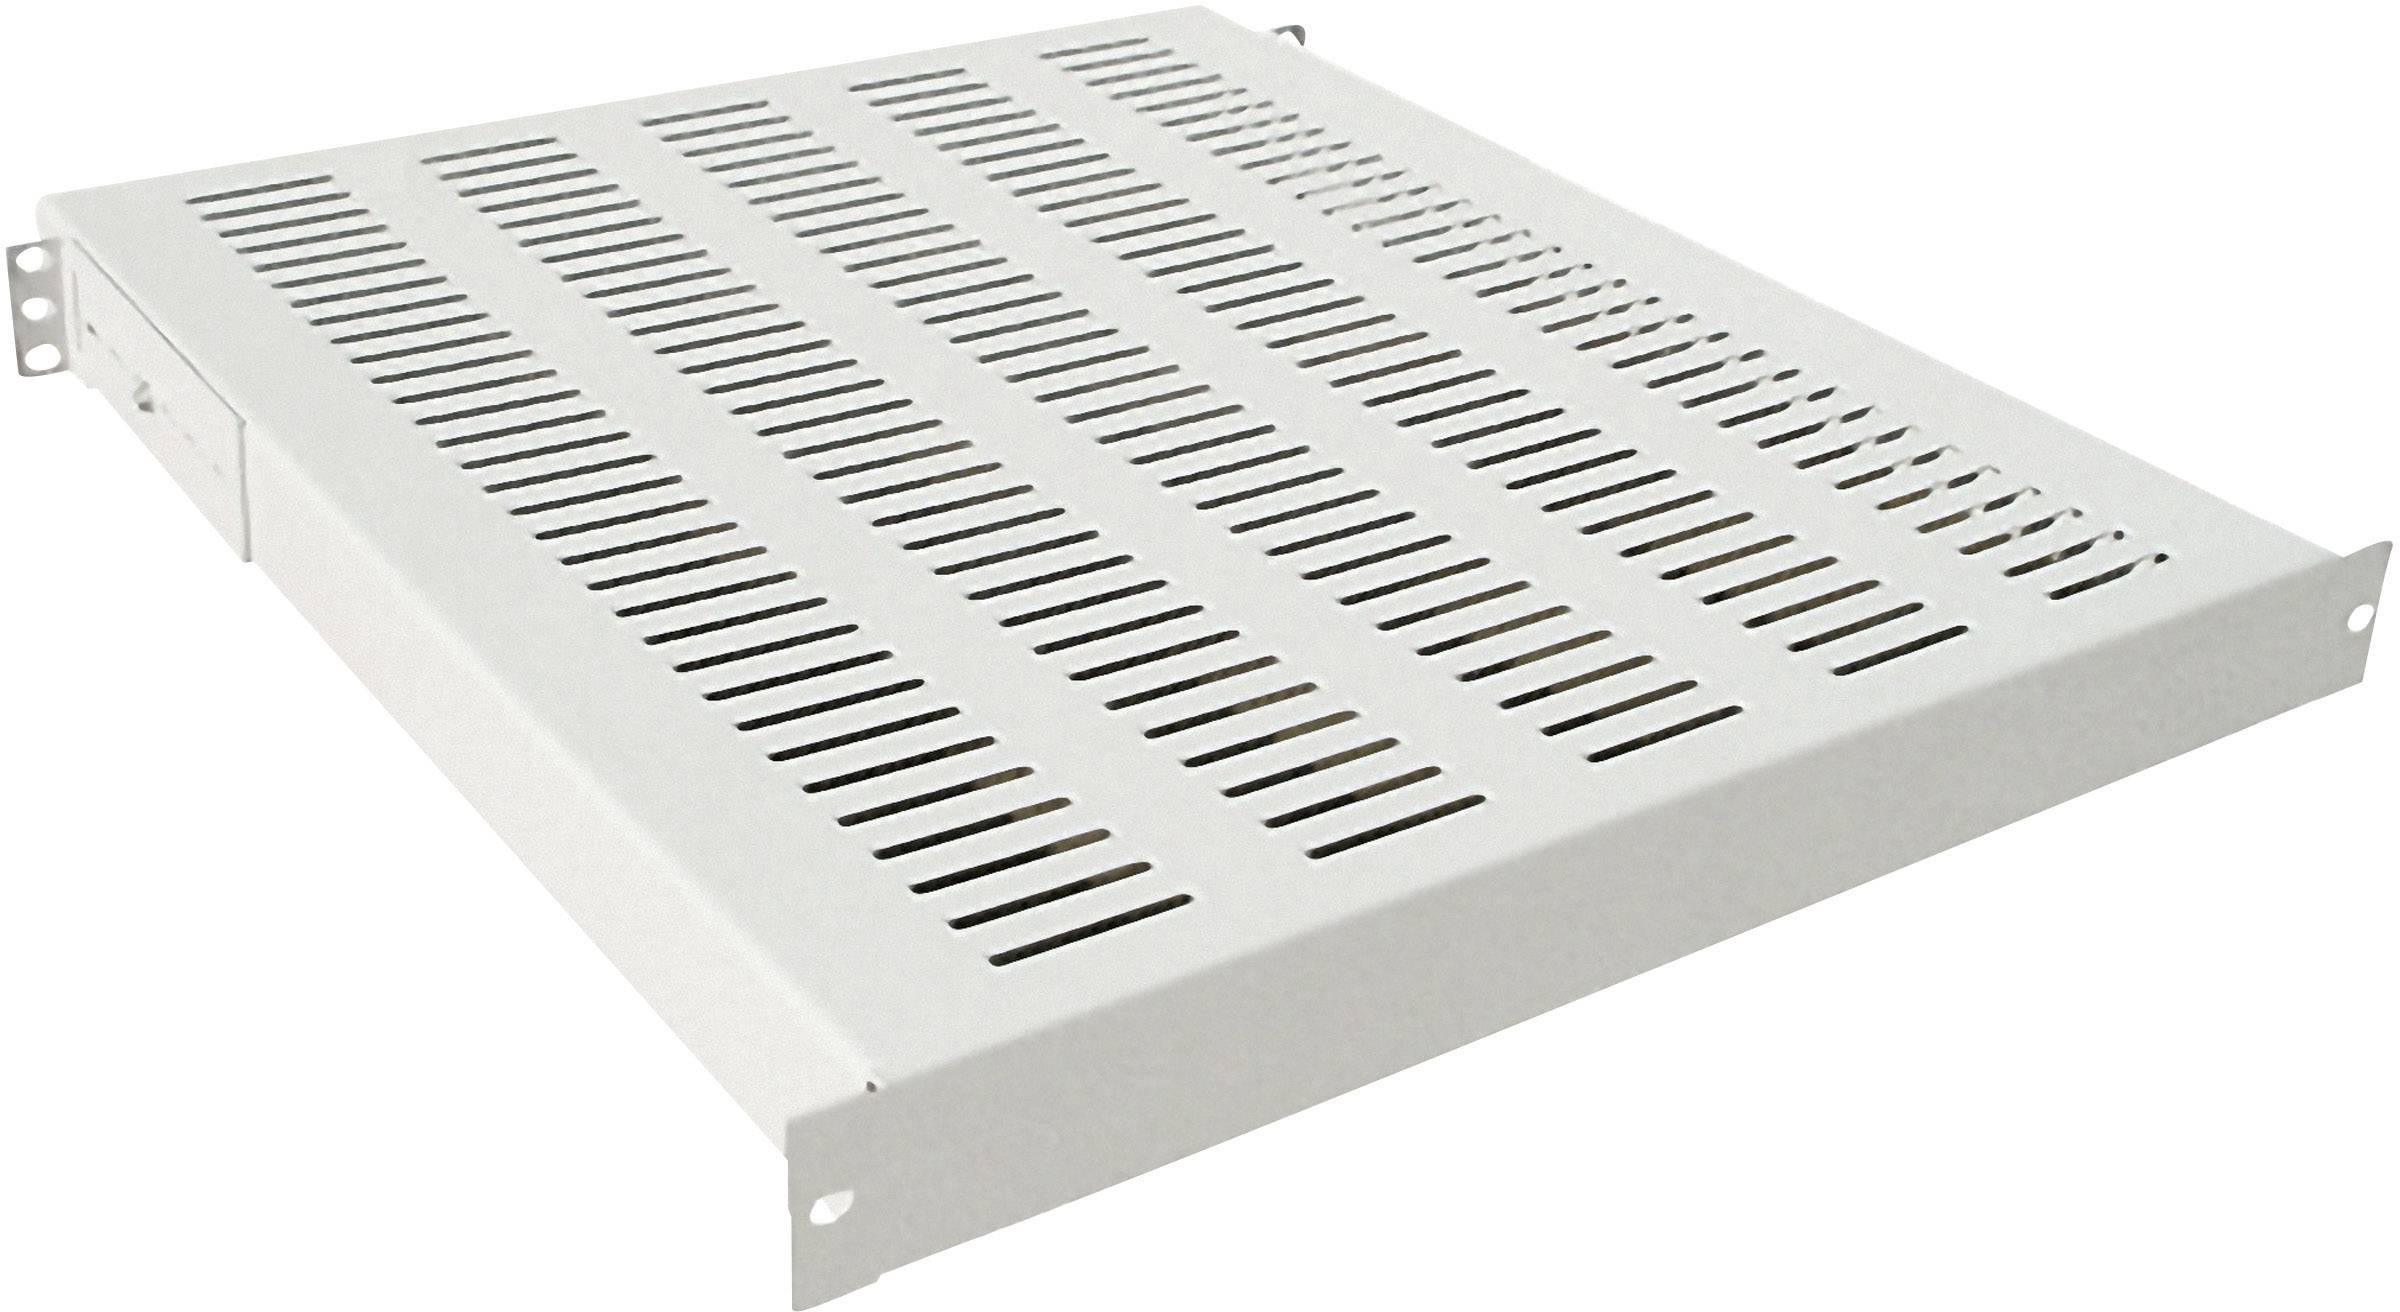 Logilink Sf1h45g 19 Server Rack Cabinet Shelf 1 U Fixed